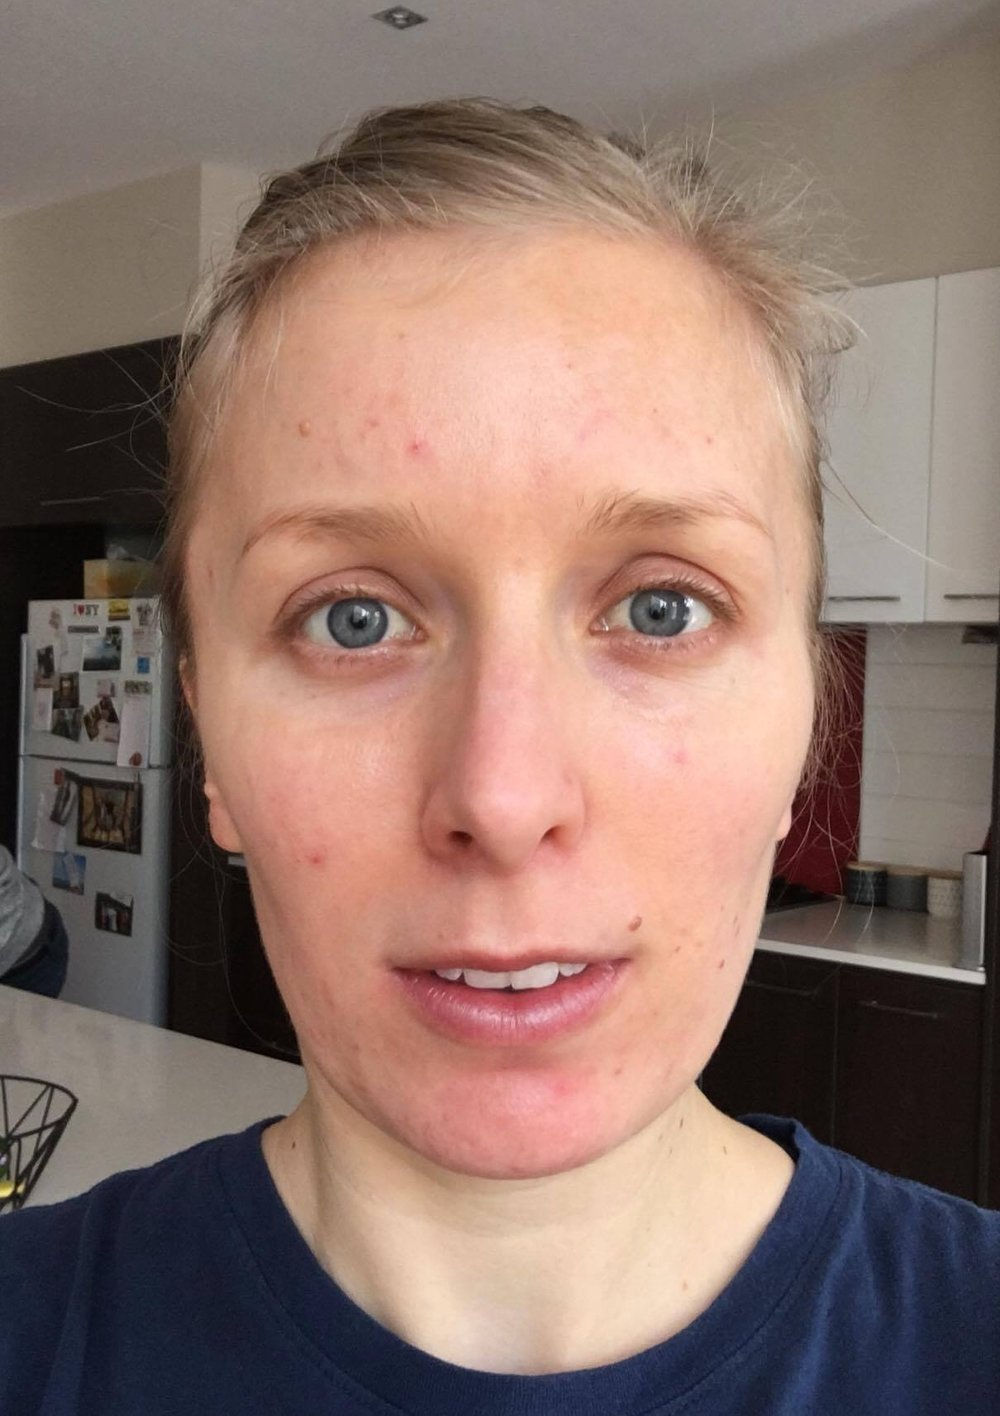 cosmelan dipigmentation peel pigmentation skin clinic melbourne